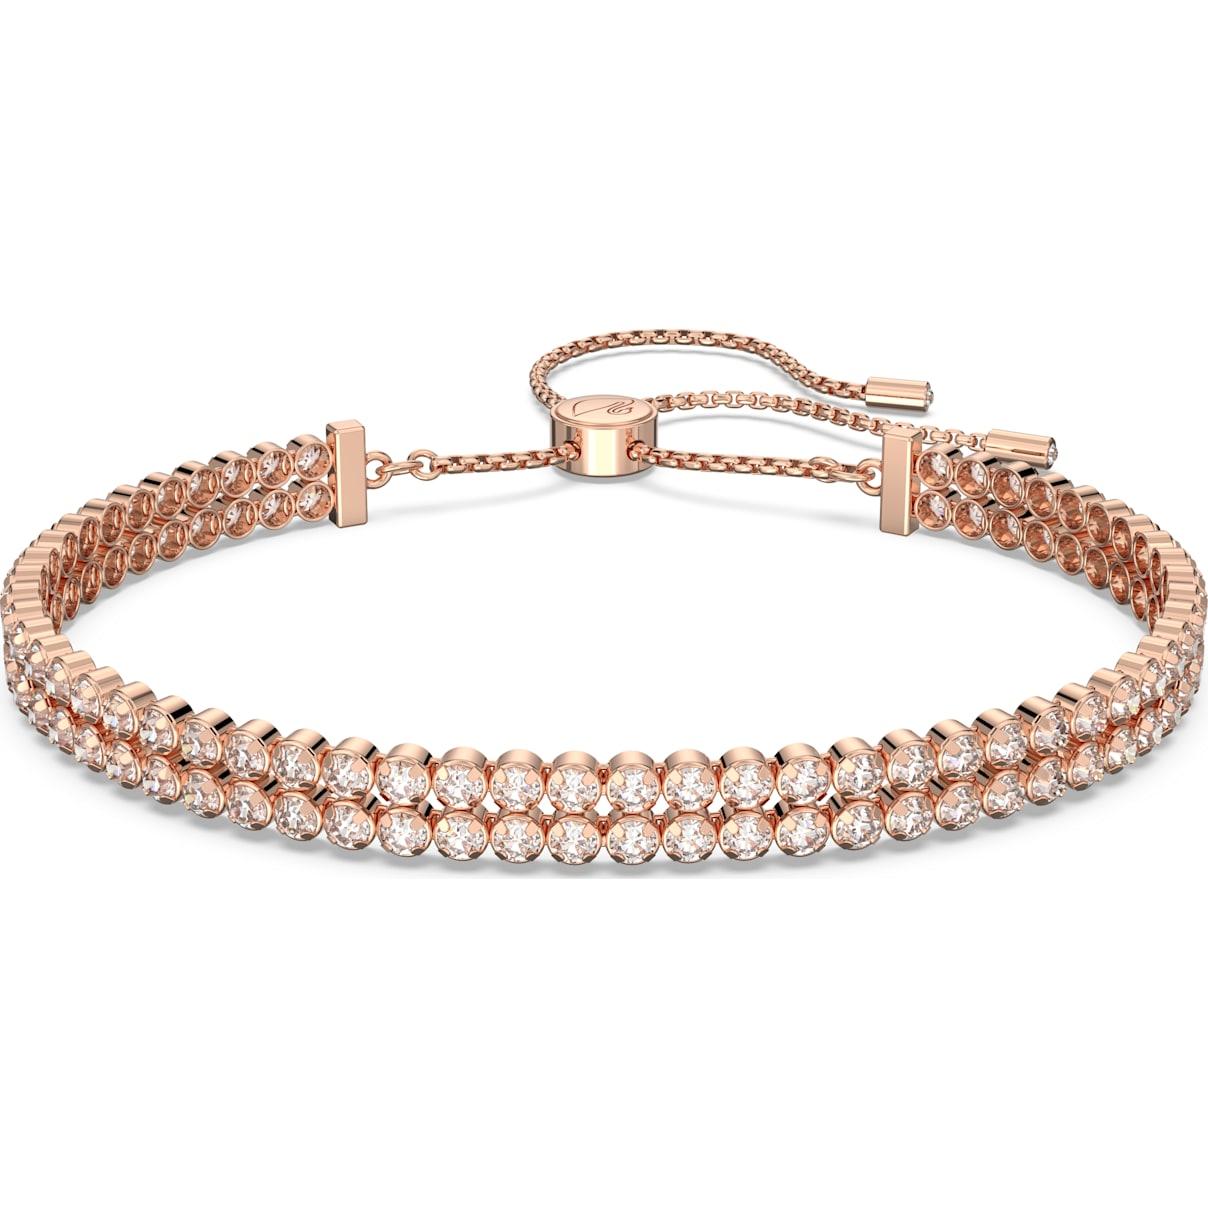 Swarovski Subtle Bracelet, White, Rose-gold tone plated